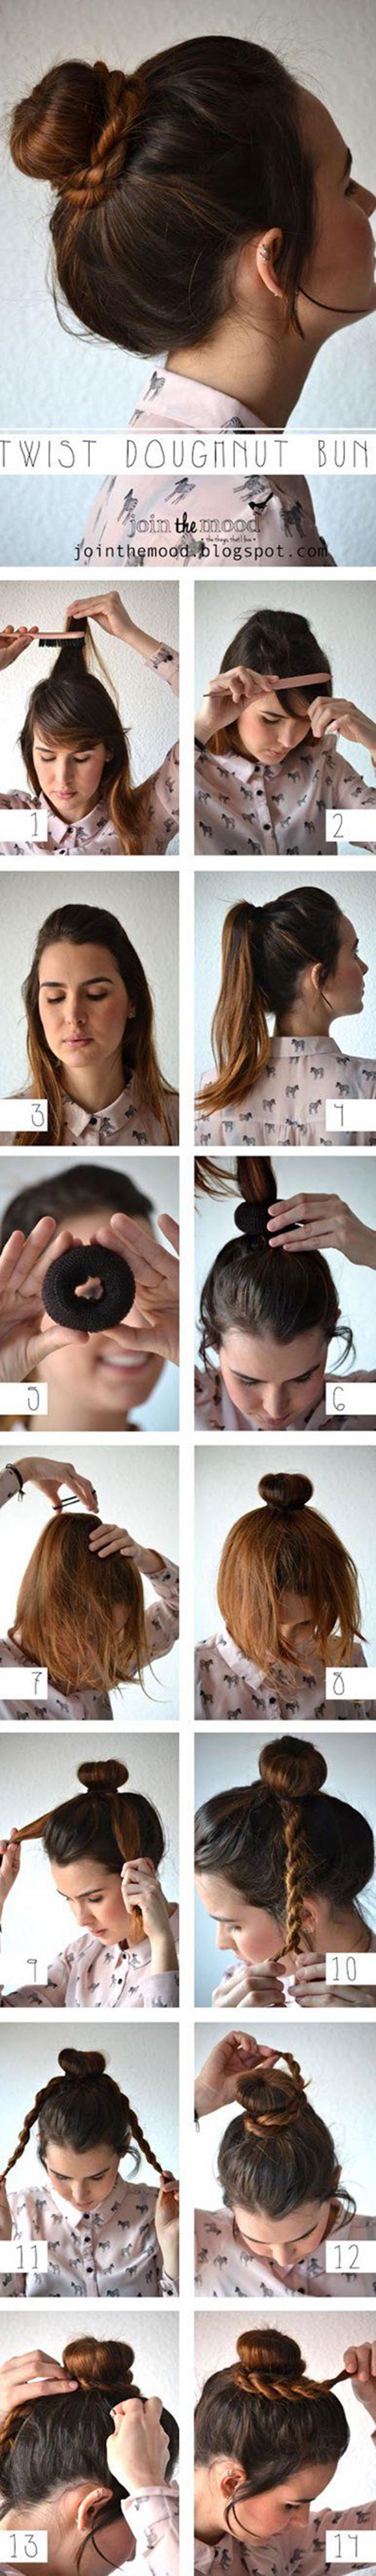 Tutoriel coiffure pinterest